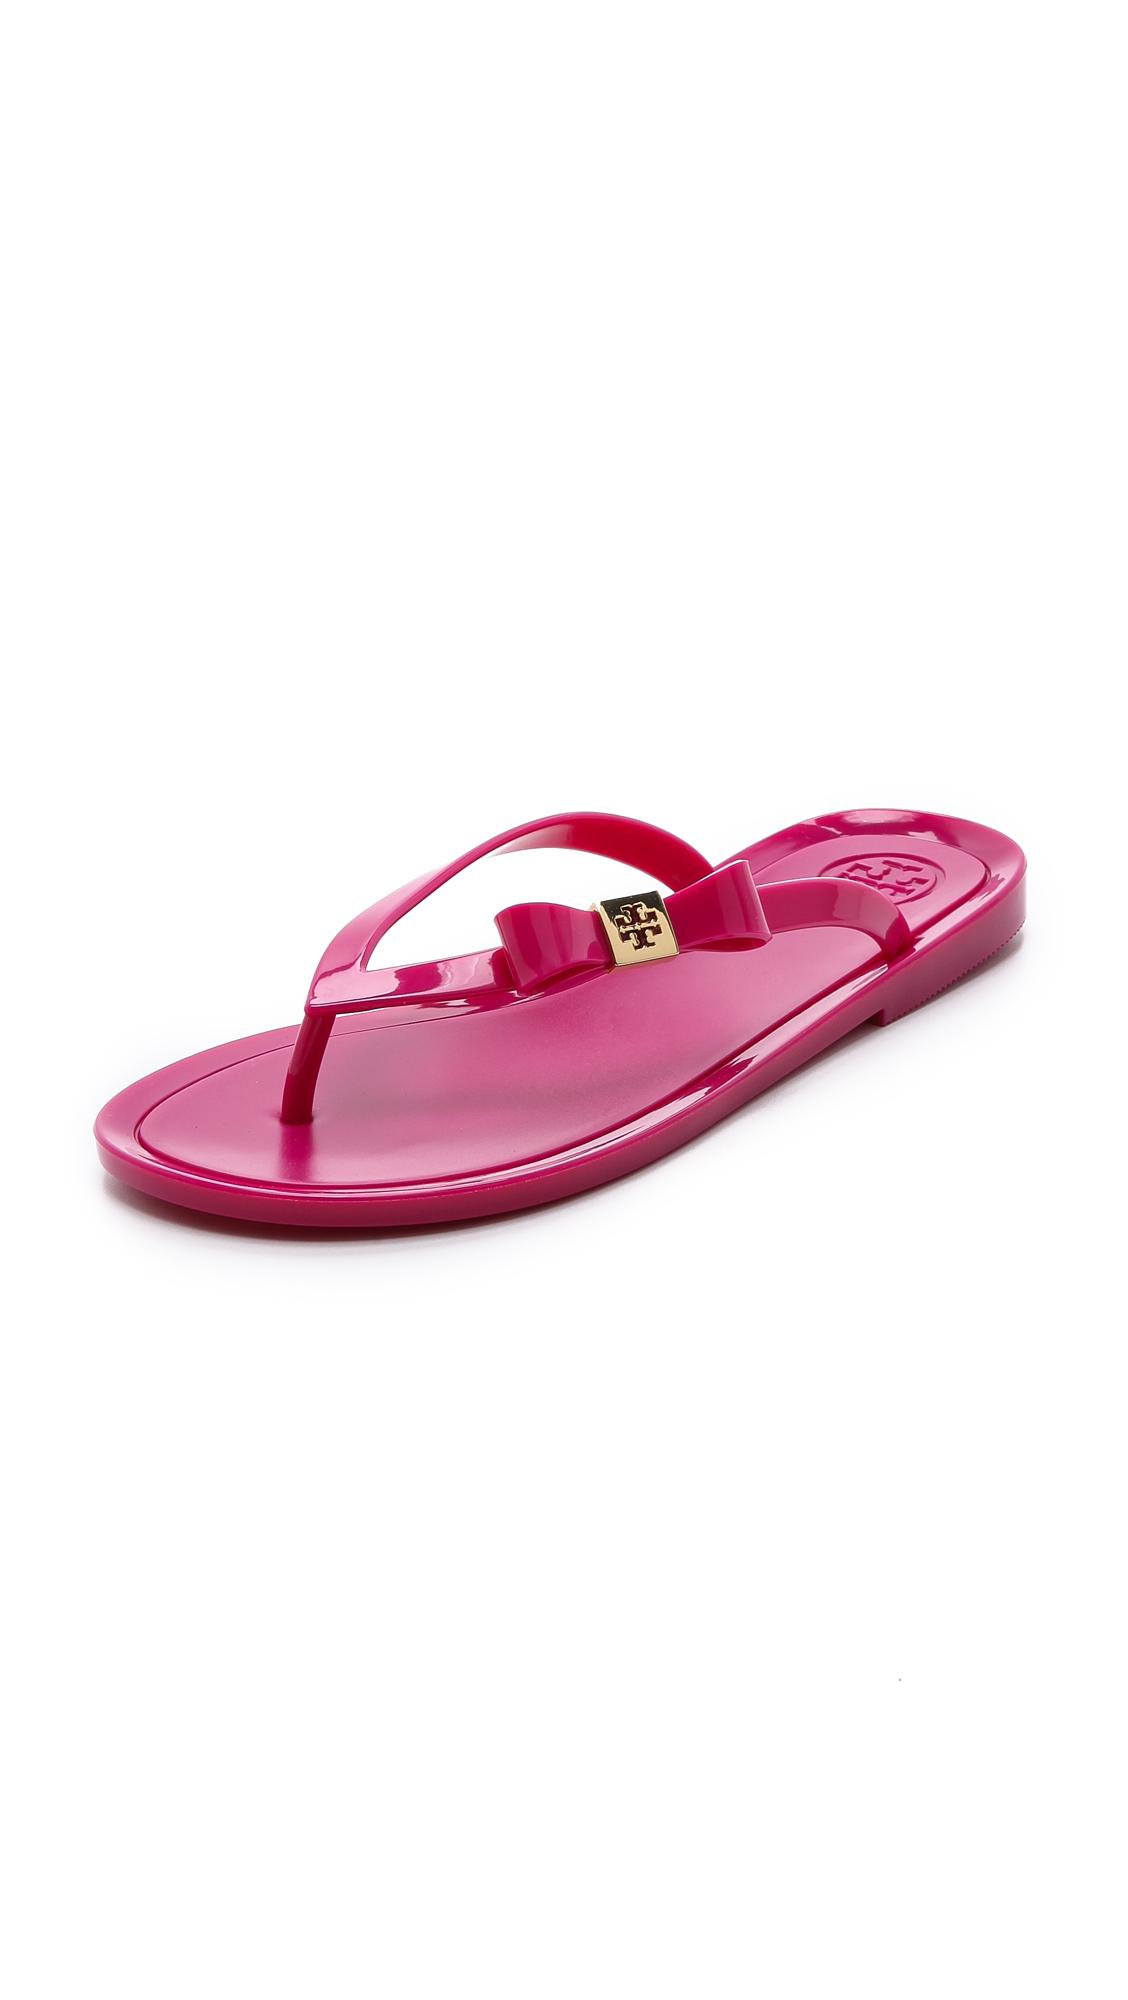 59c574a06733 Lyst - Tory Burch Michaela Bow Jelly Flip Flops - Dark Fuchsia in Pink